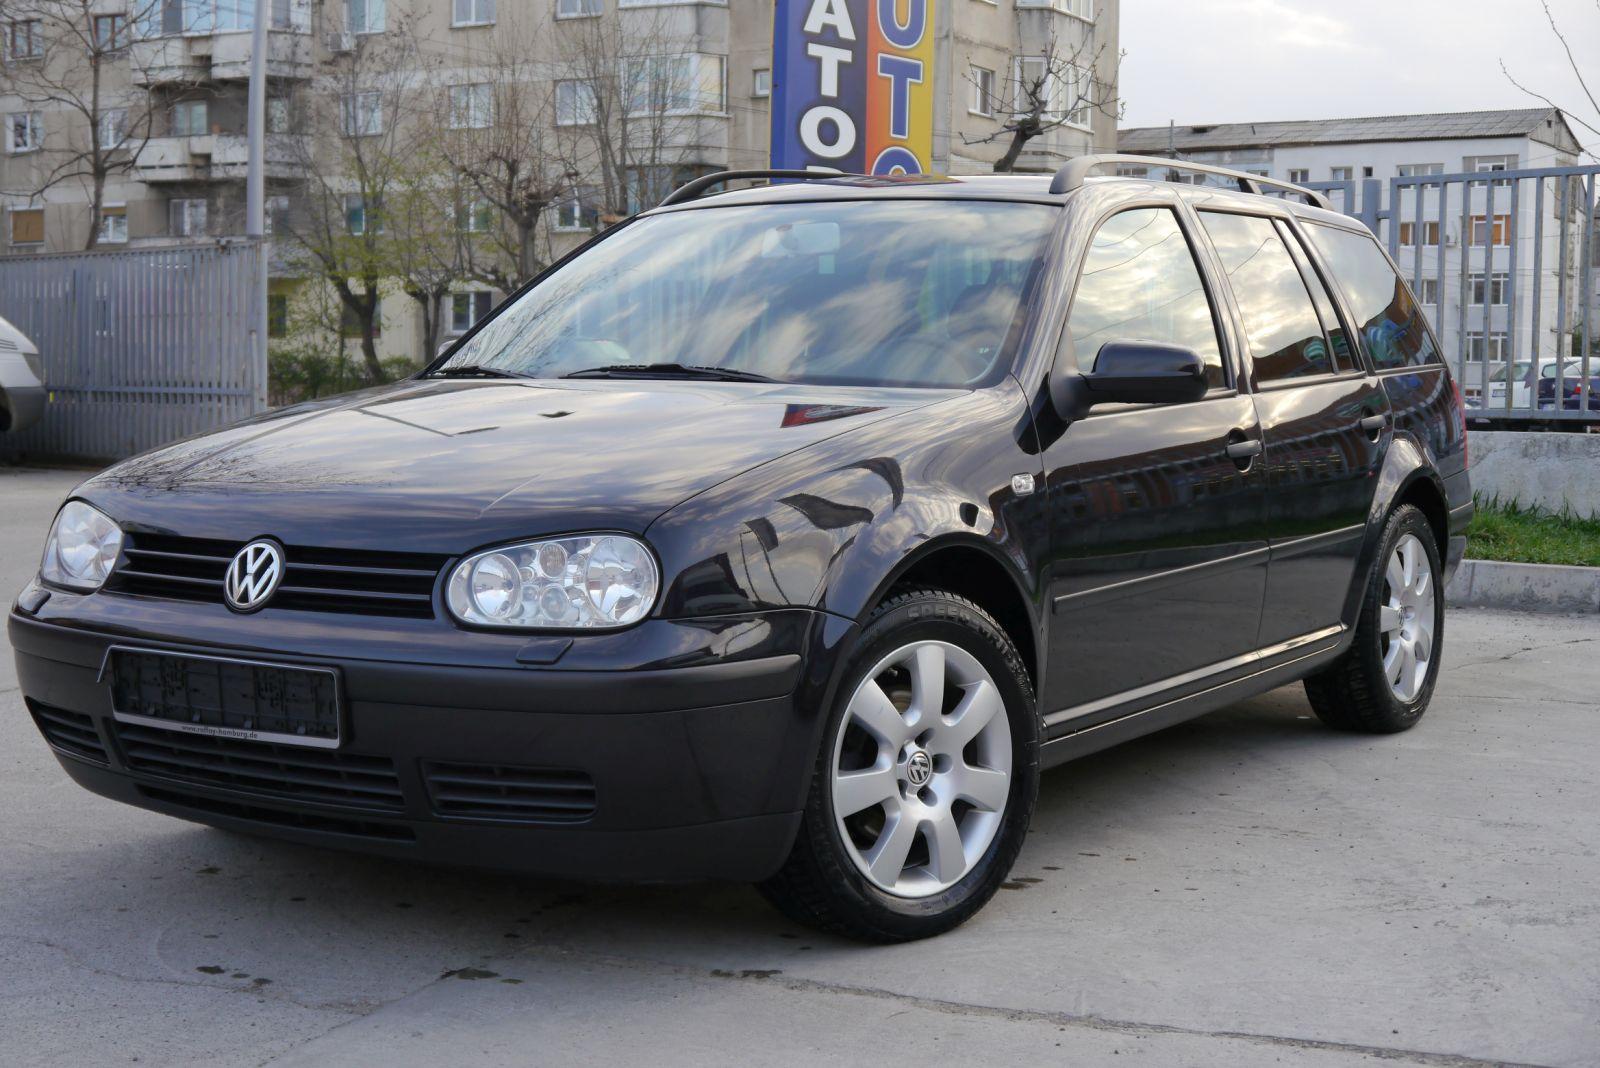 volkswagen golf iv 1 4 edition 2001 euro 4 climatronic vanduta vanzari auto second hand. Black Bedroom Furniture Sets. Home Design Ideas